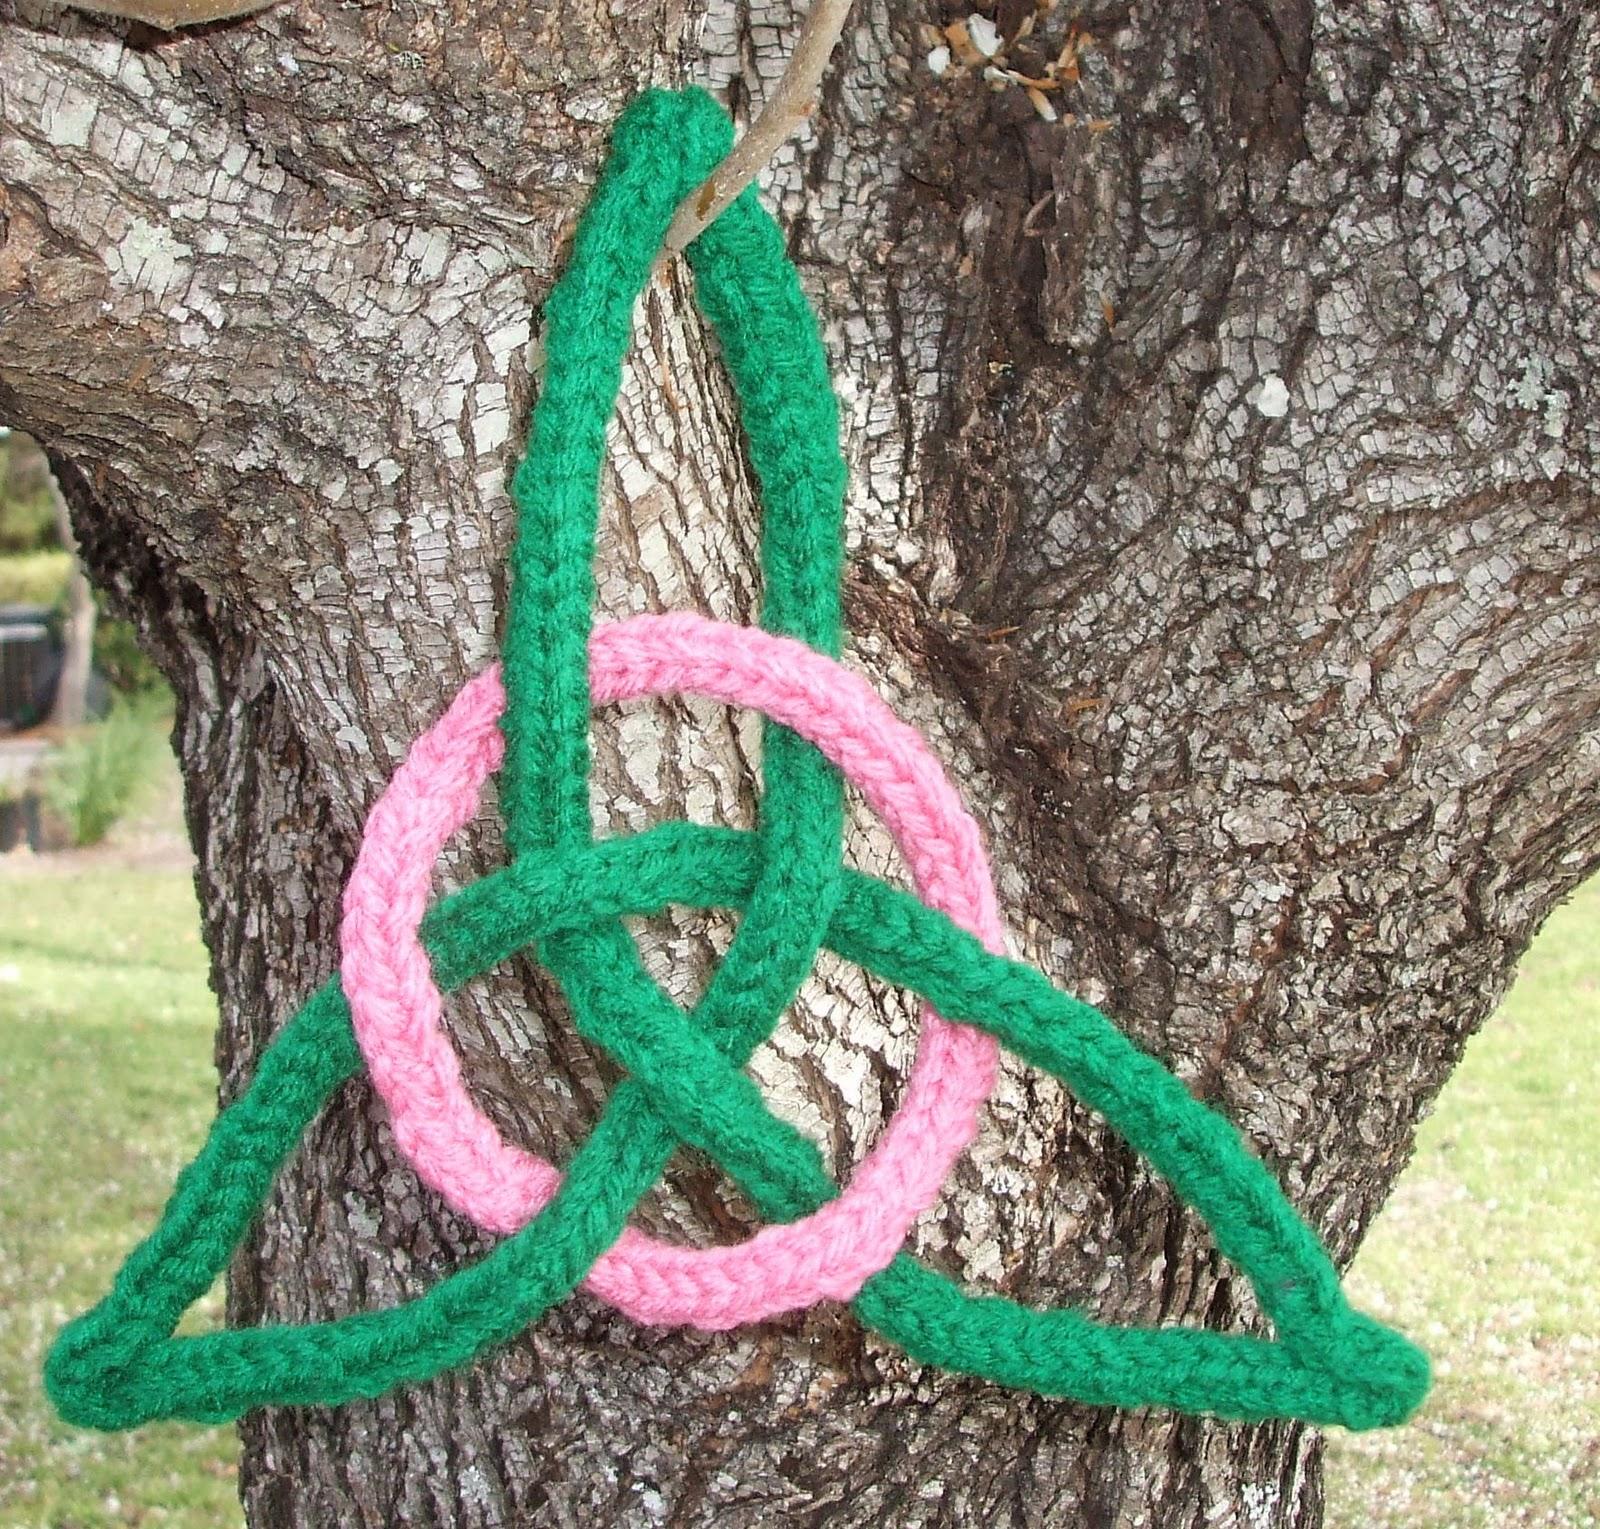 Celtic Trinity Knot Knitting Pattern : Crocheting in Georgia: Celtic Trinity Knot Hot Pad